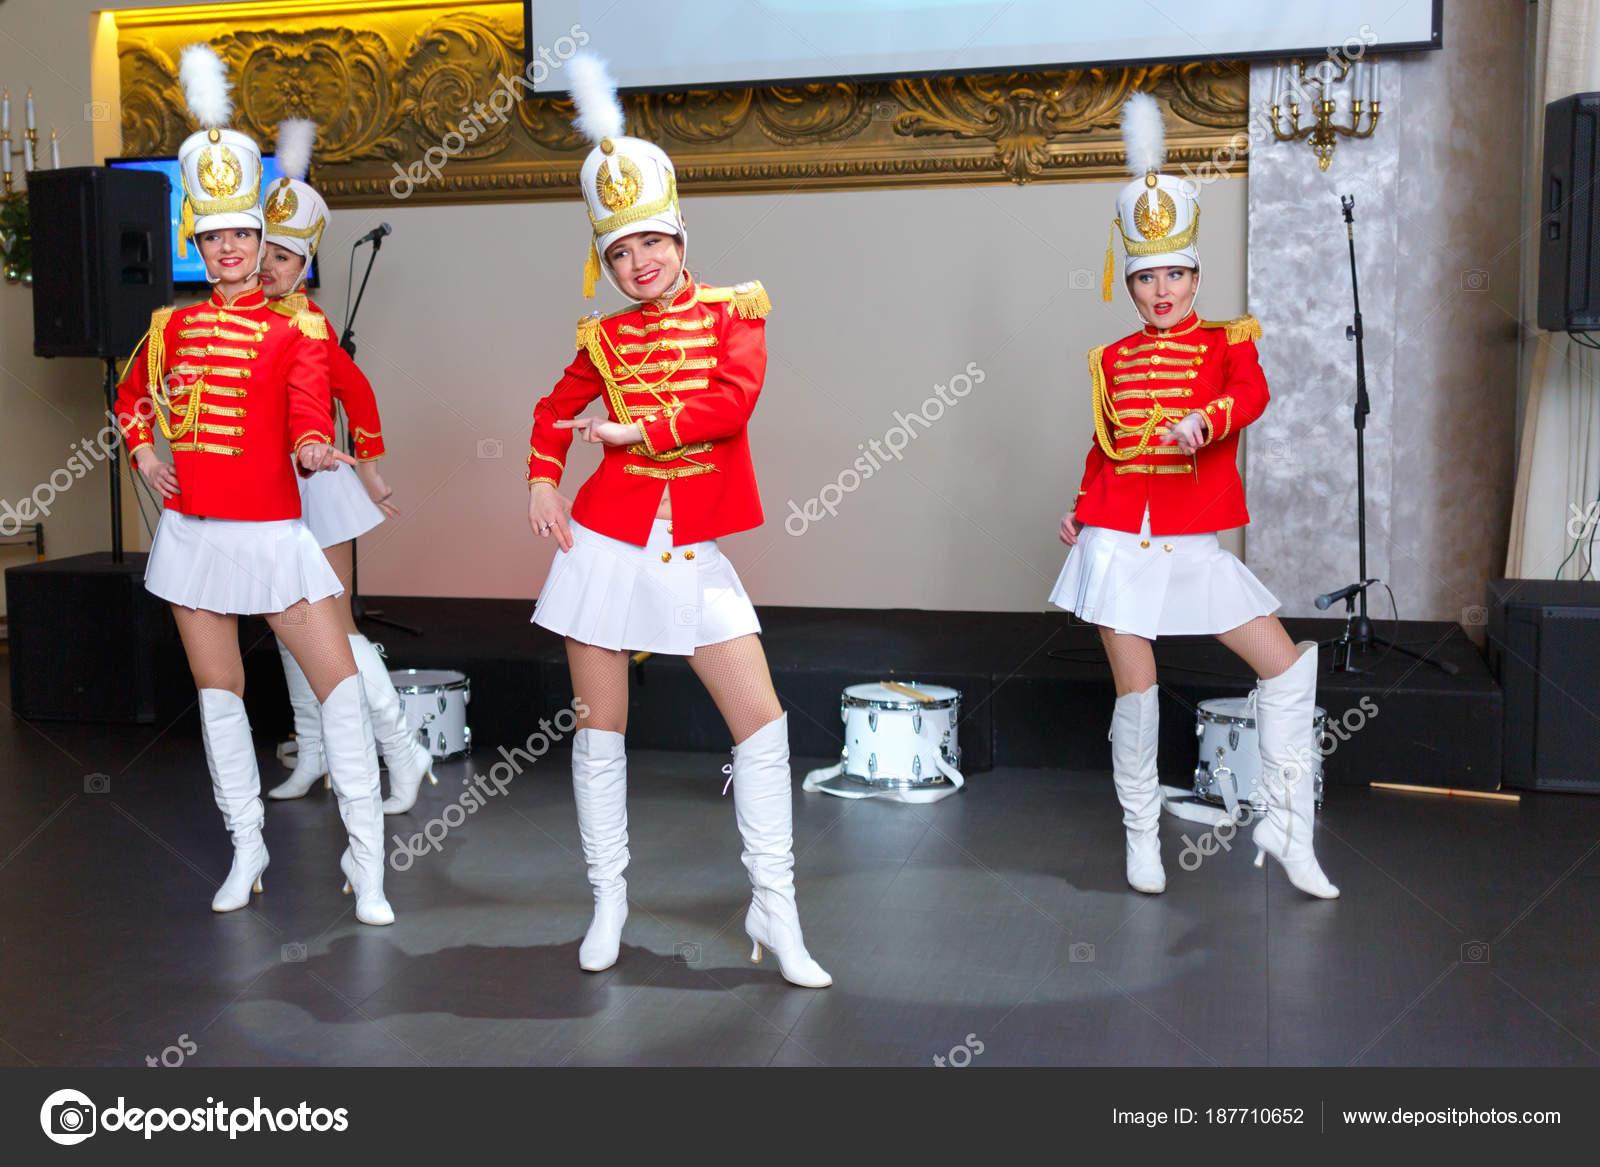 Saint Petersburg, Russia - December 15, 2017: Girls in red